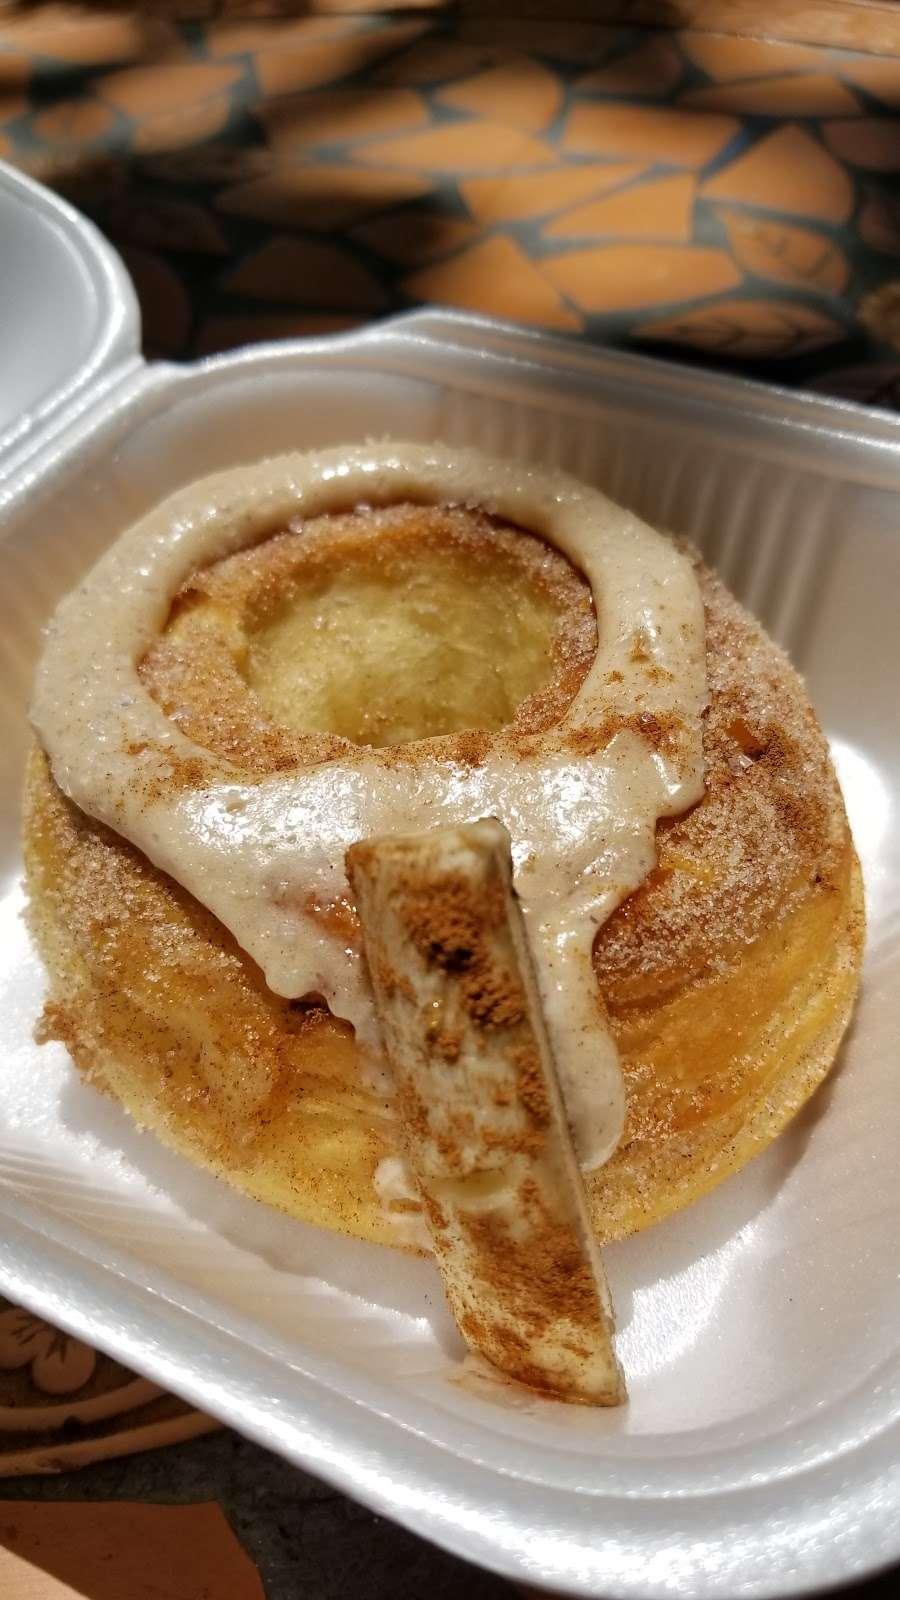 Bright Bear Bakery Plus - bakery  | Photo 9 of 10 | Address: 2620 Lakeville Hwy #350, Petaluma, CA 94954, USA | Phone: (707) 787-7411